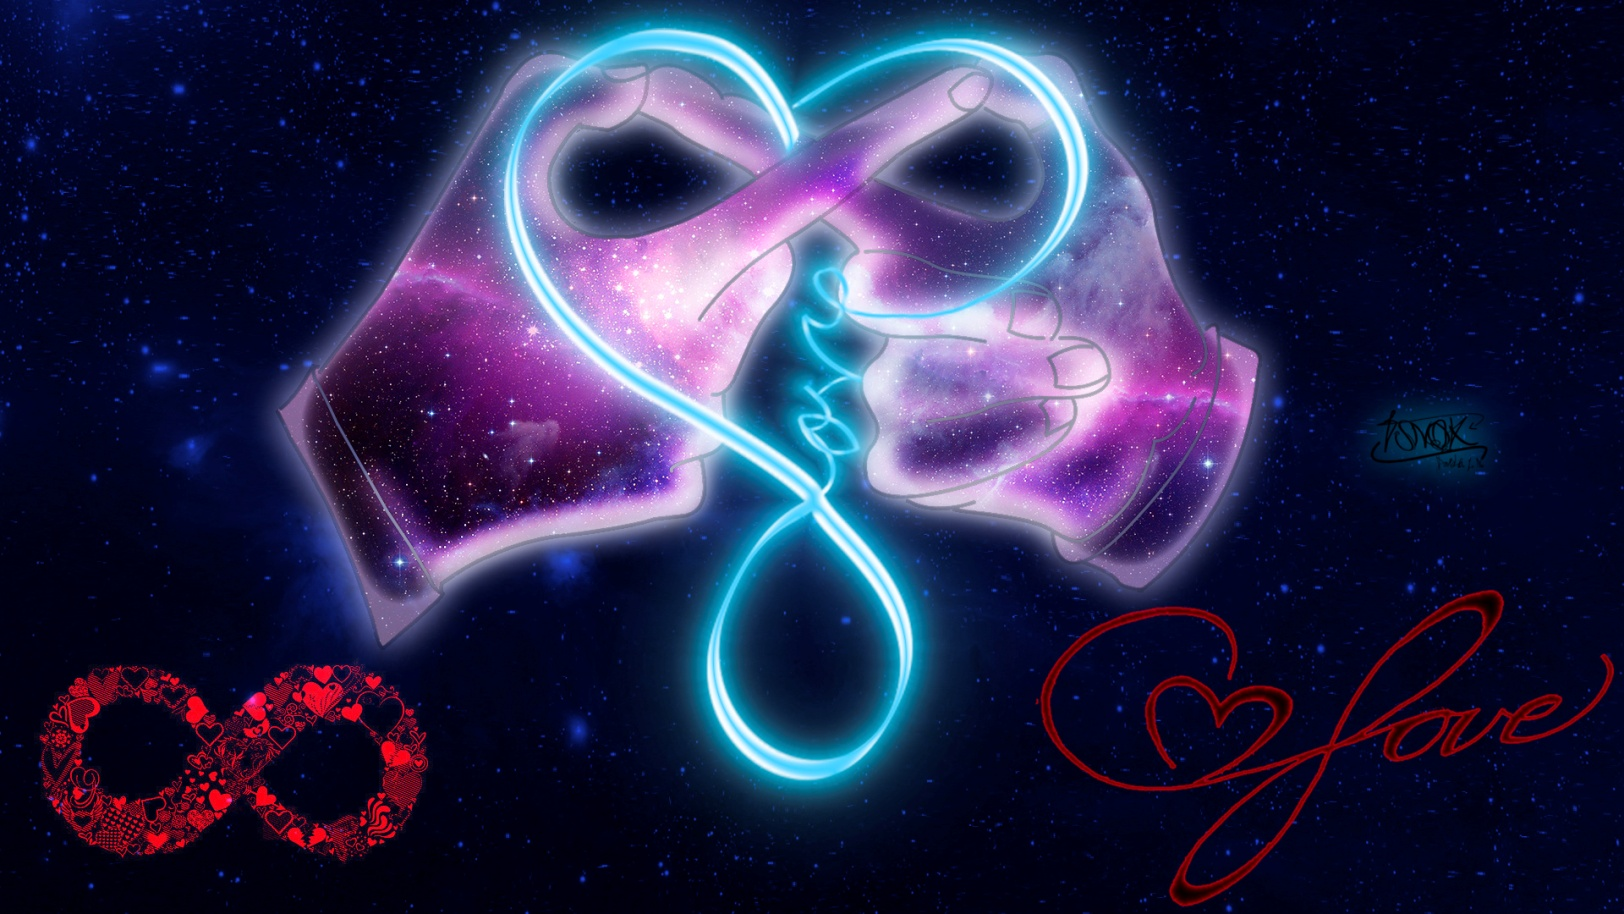 http://www.baltana.com/files/wallpapers-9/Infinite-Love-Couple-Hand-Wallpaper-27554.jpg